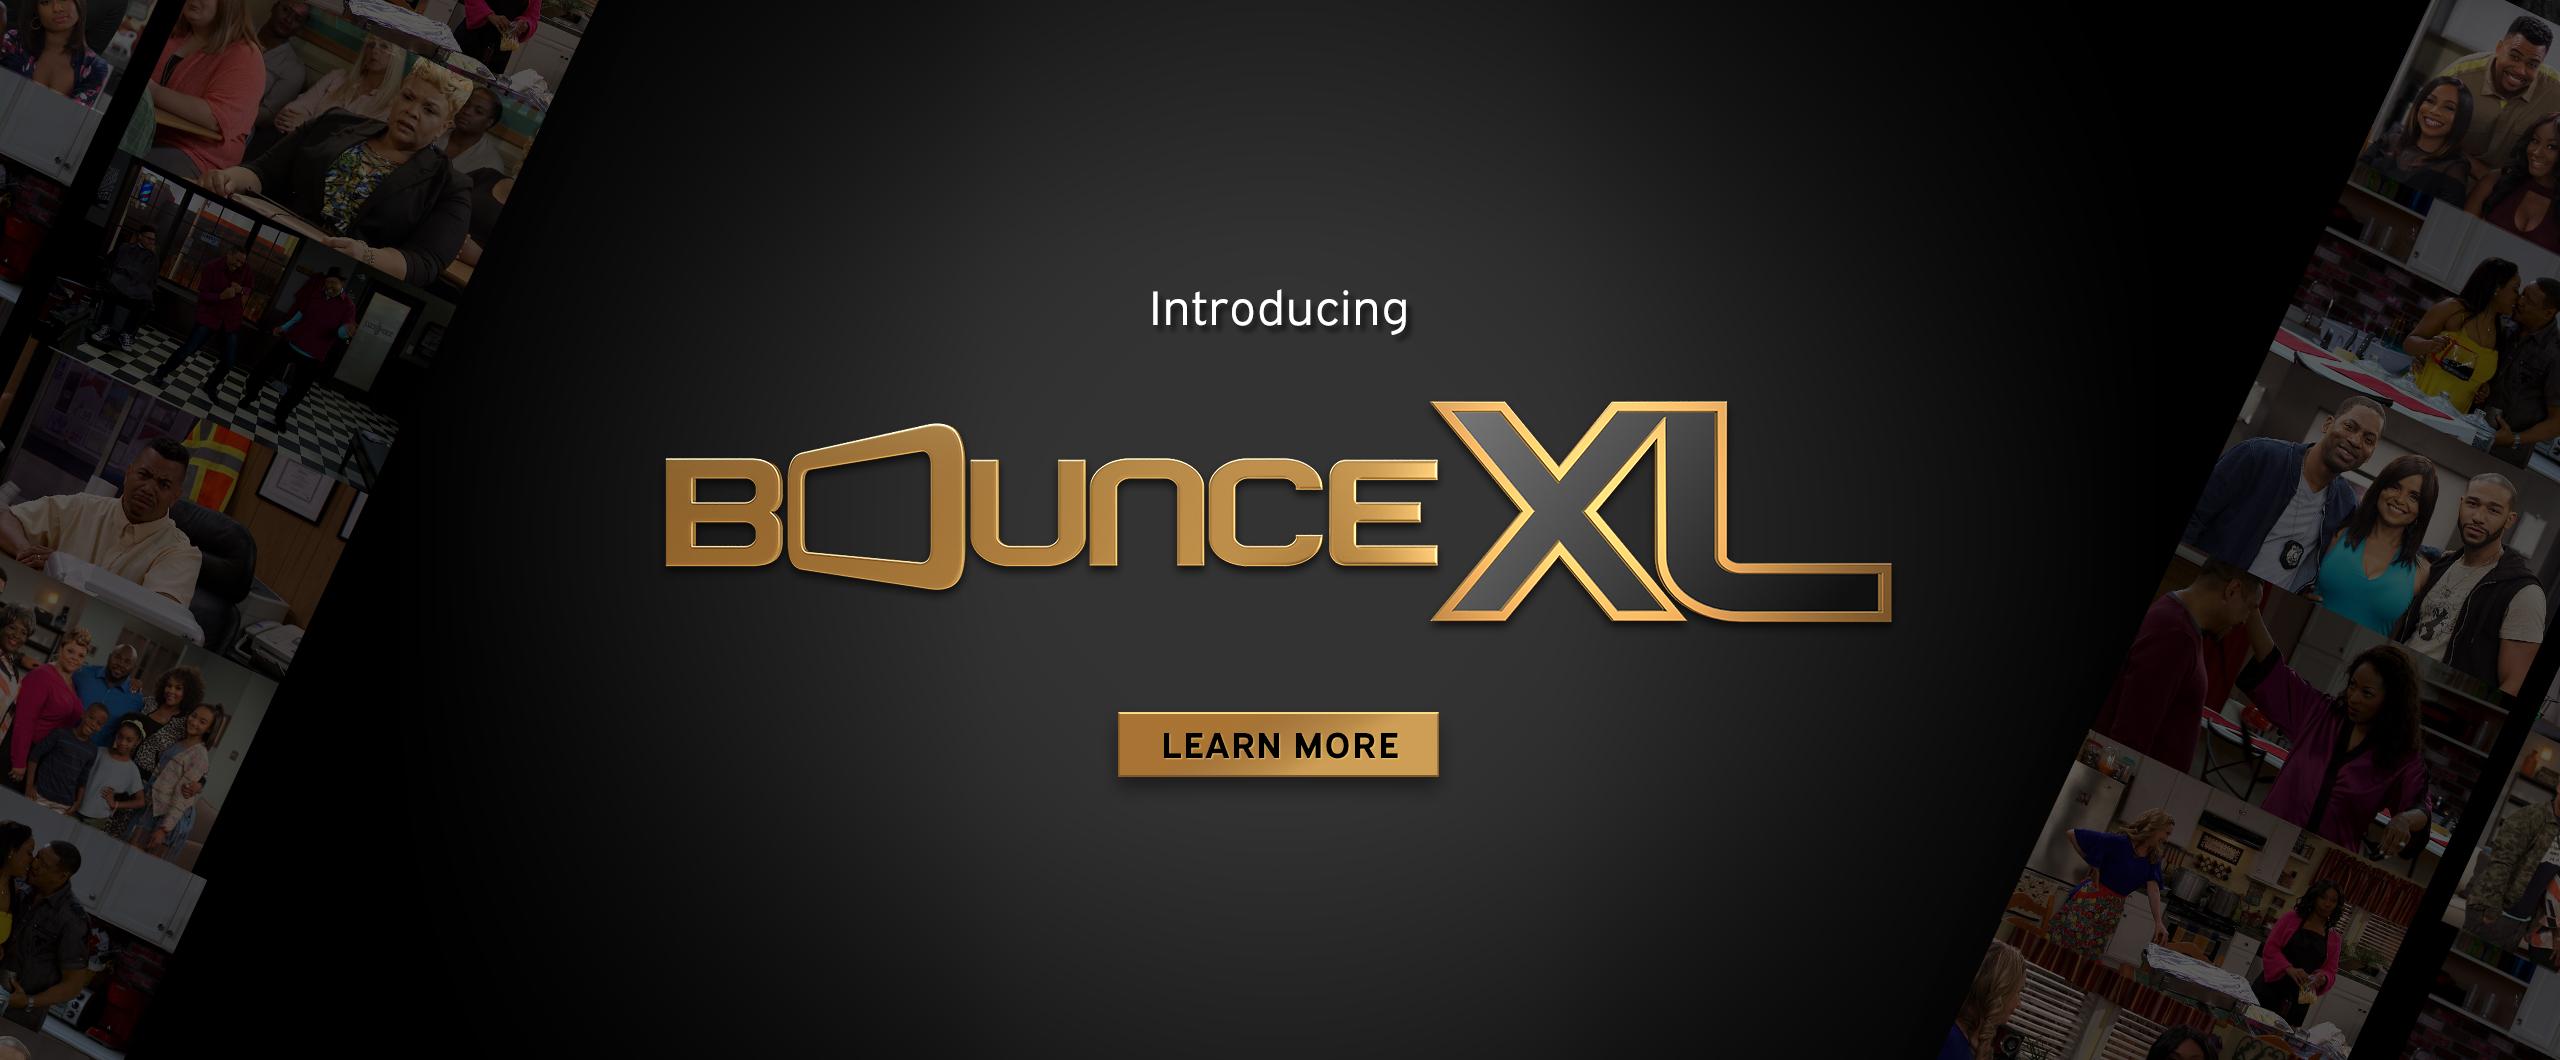 Bounce XL